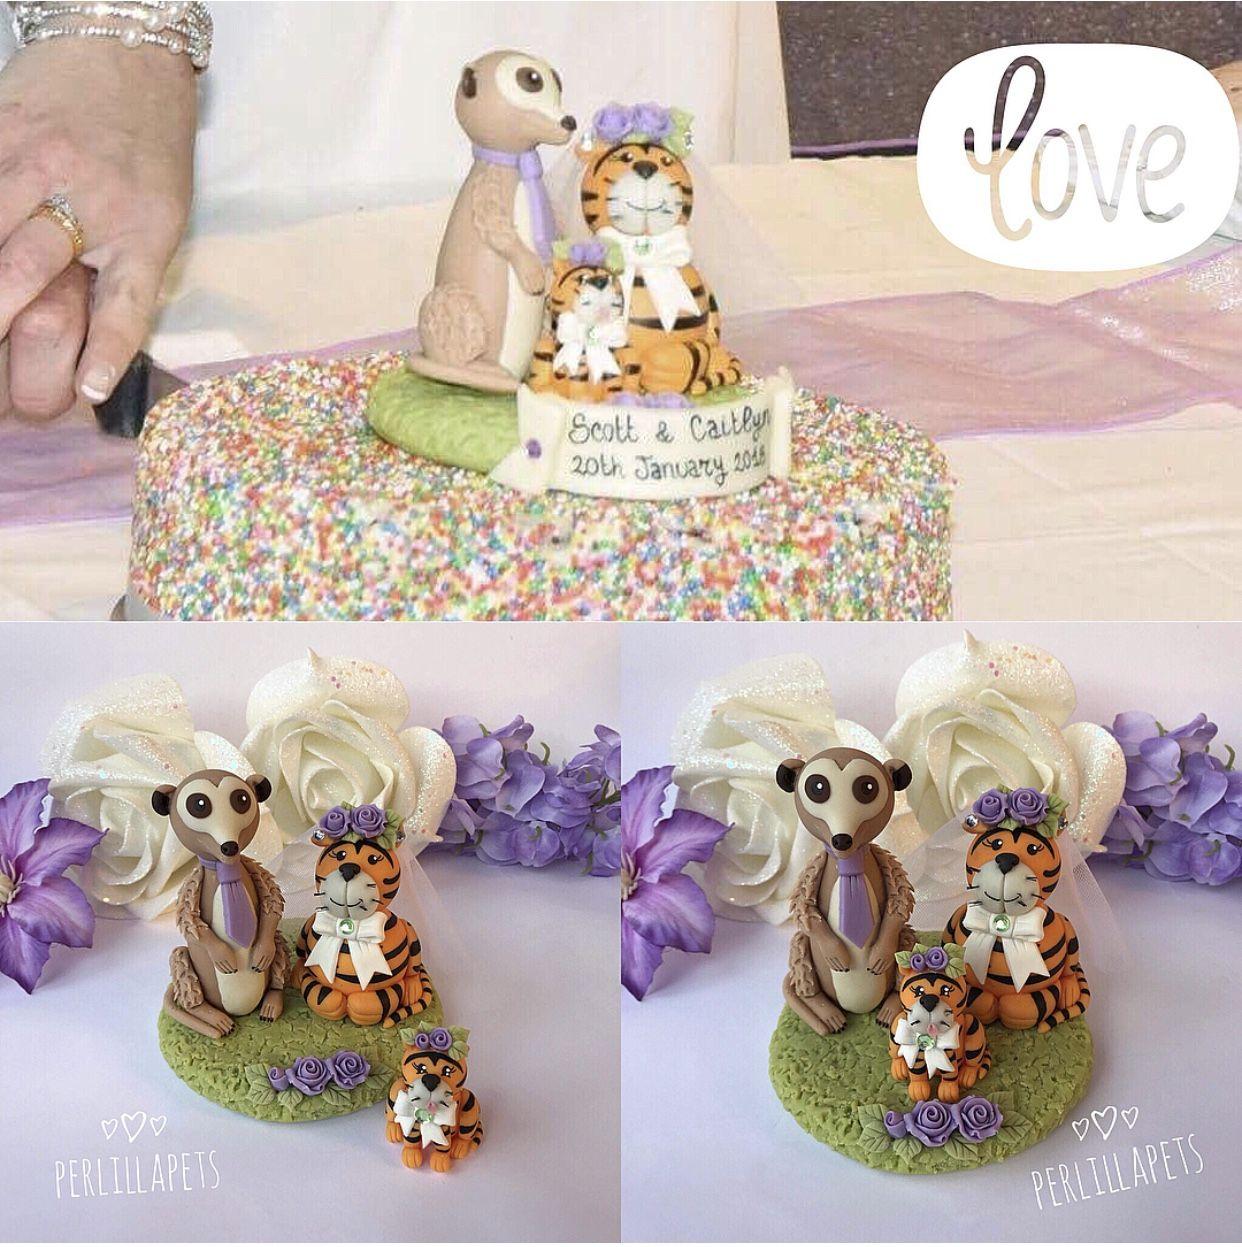 Meerkat groom & Tiger bride wedding cake topper Congratulations to ...